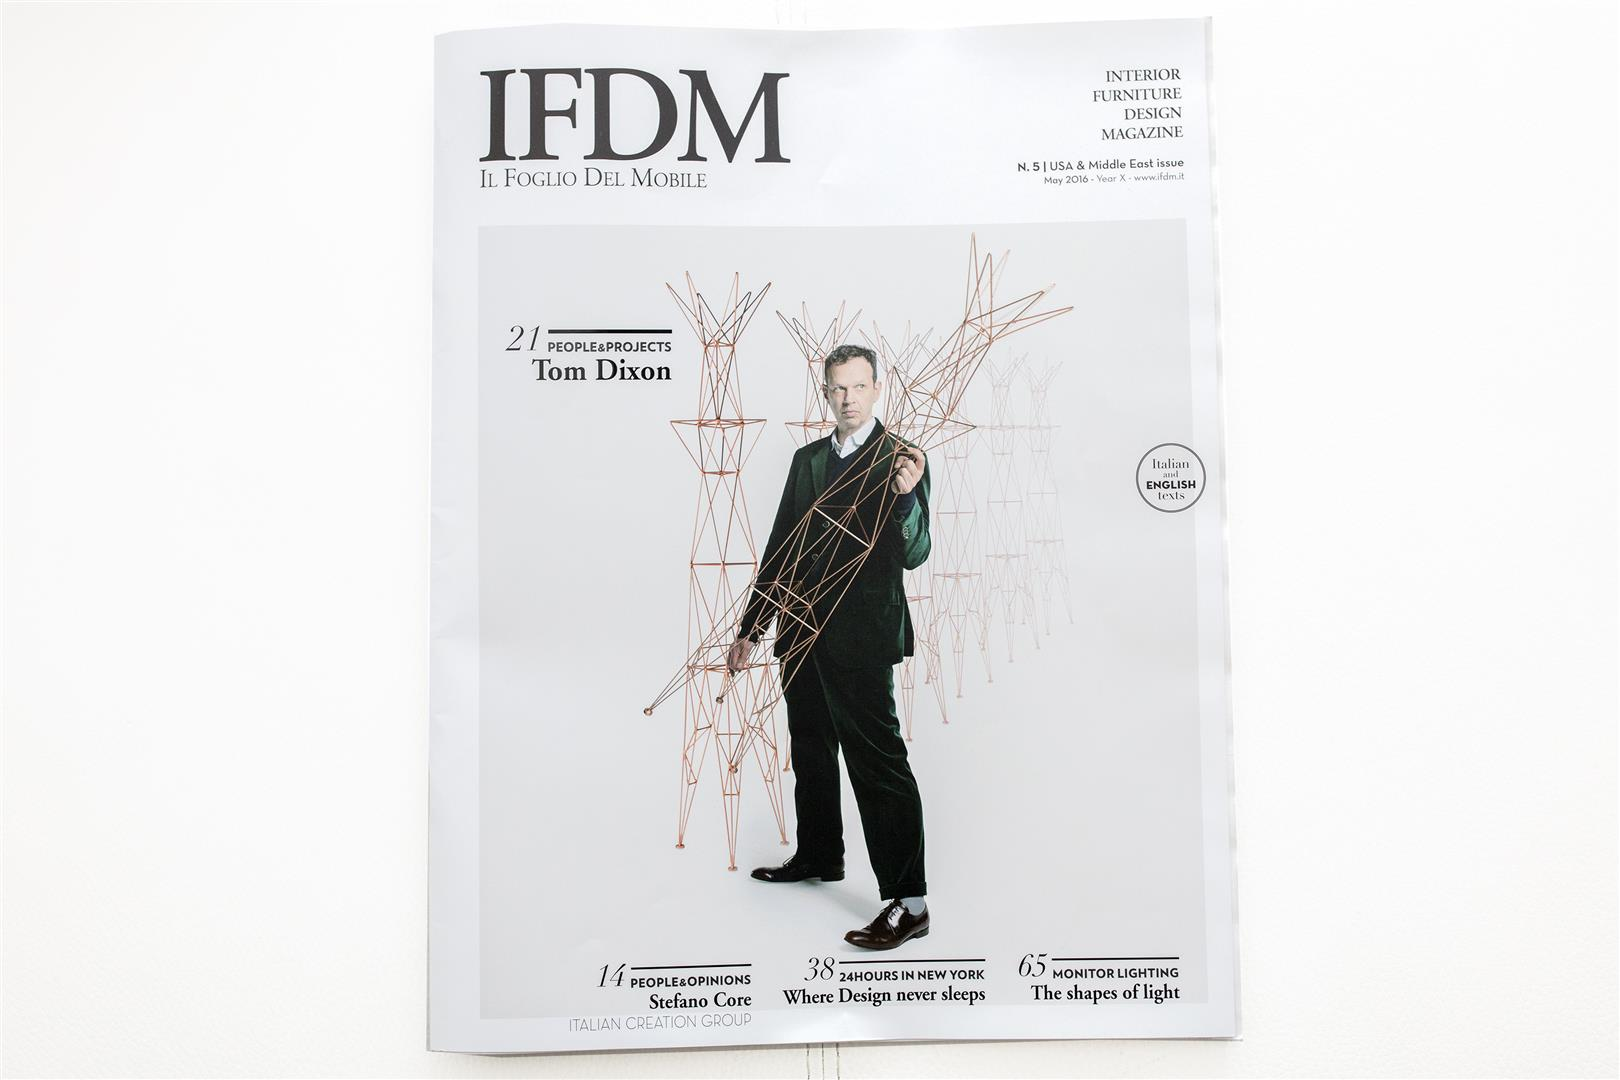 IFDM n.5-2016 USA & Middle East issue print - Christian Klugmann.jpg